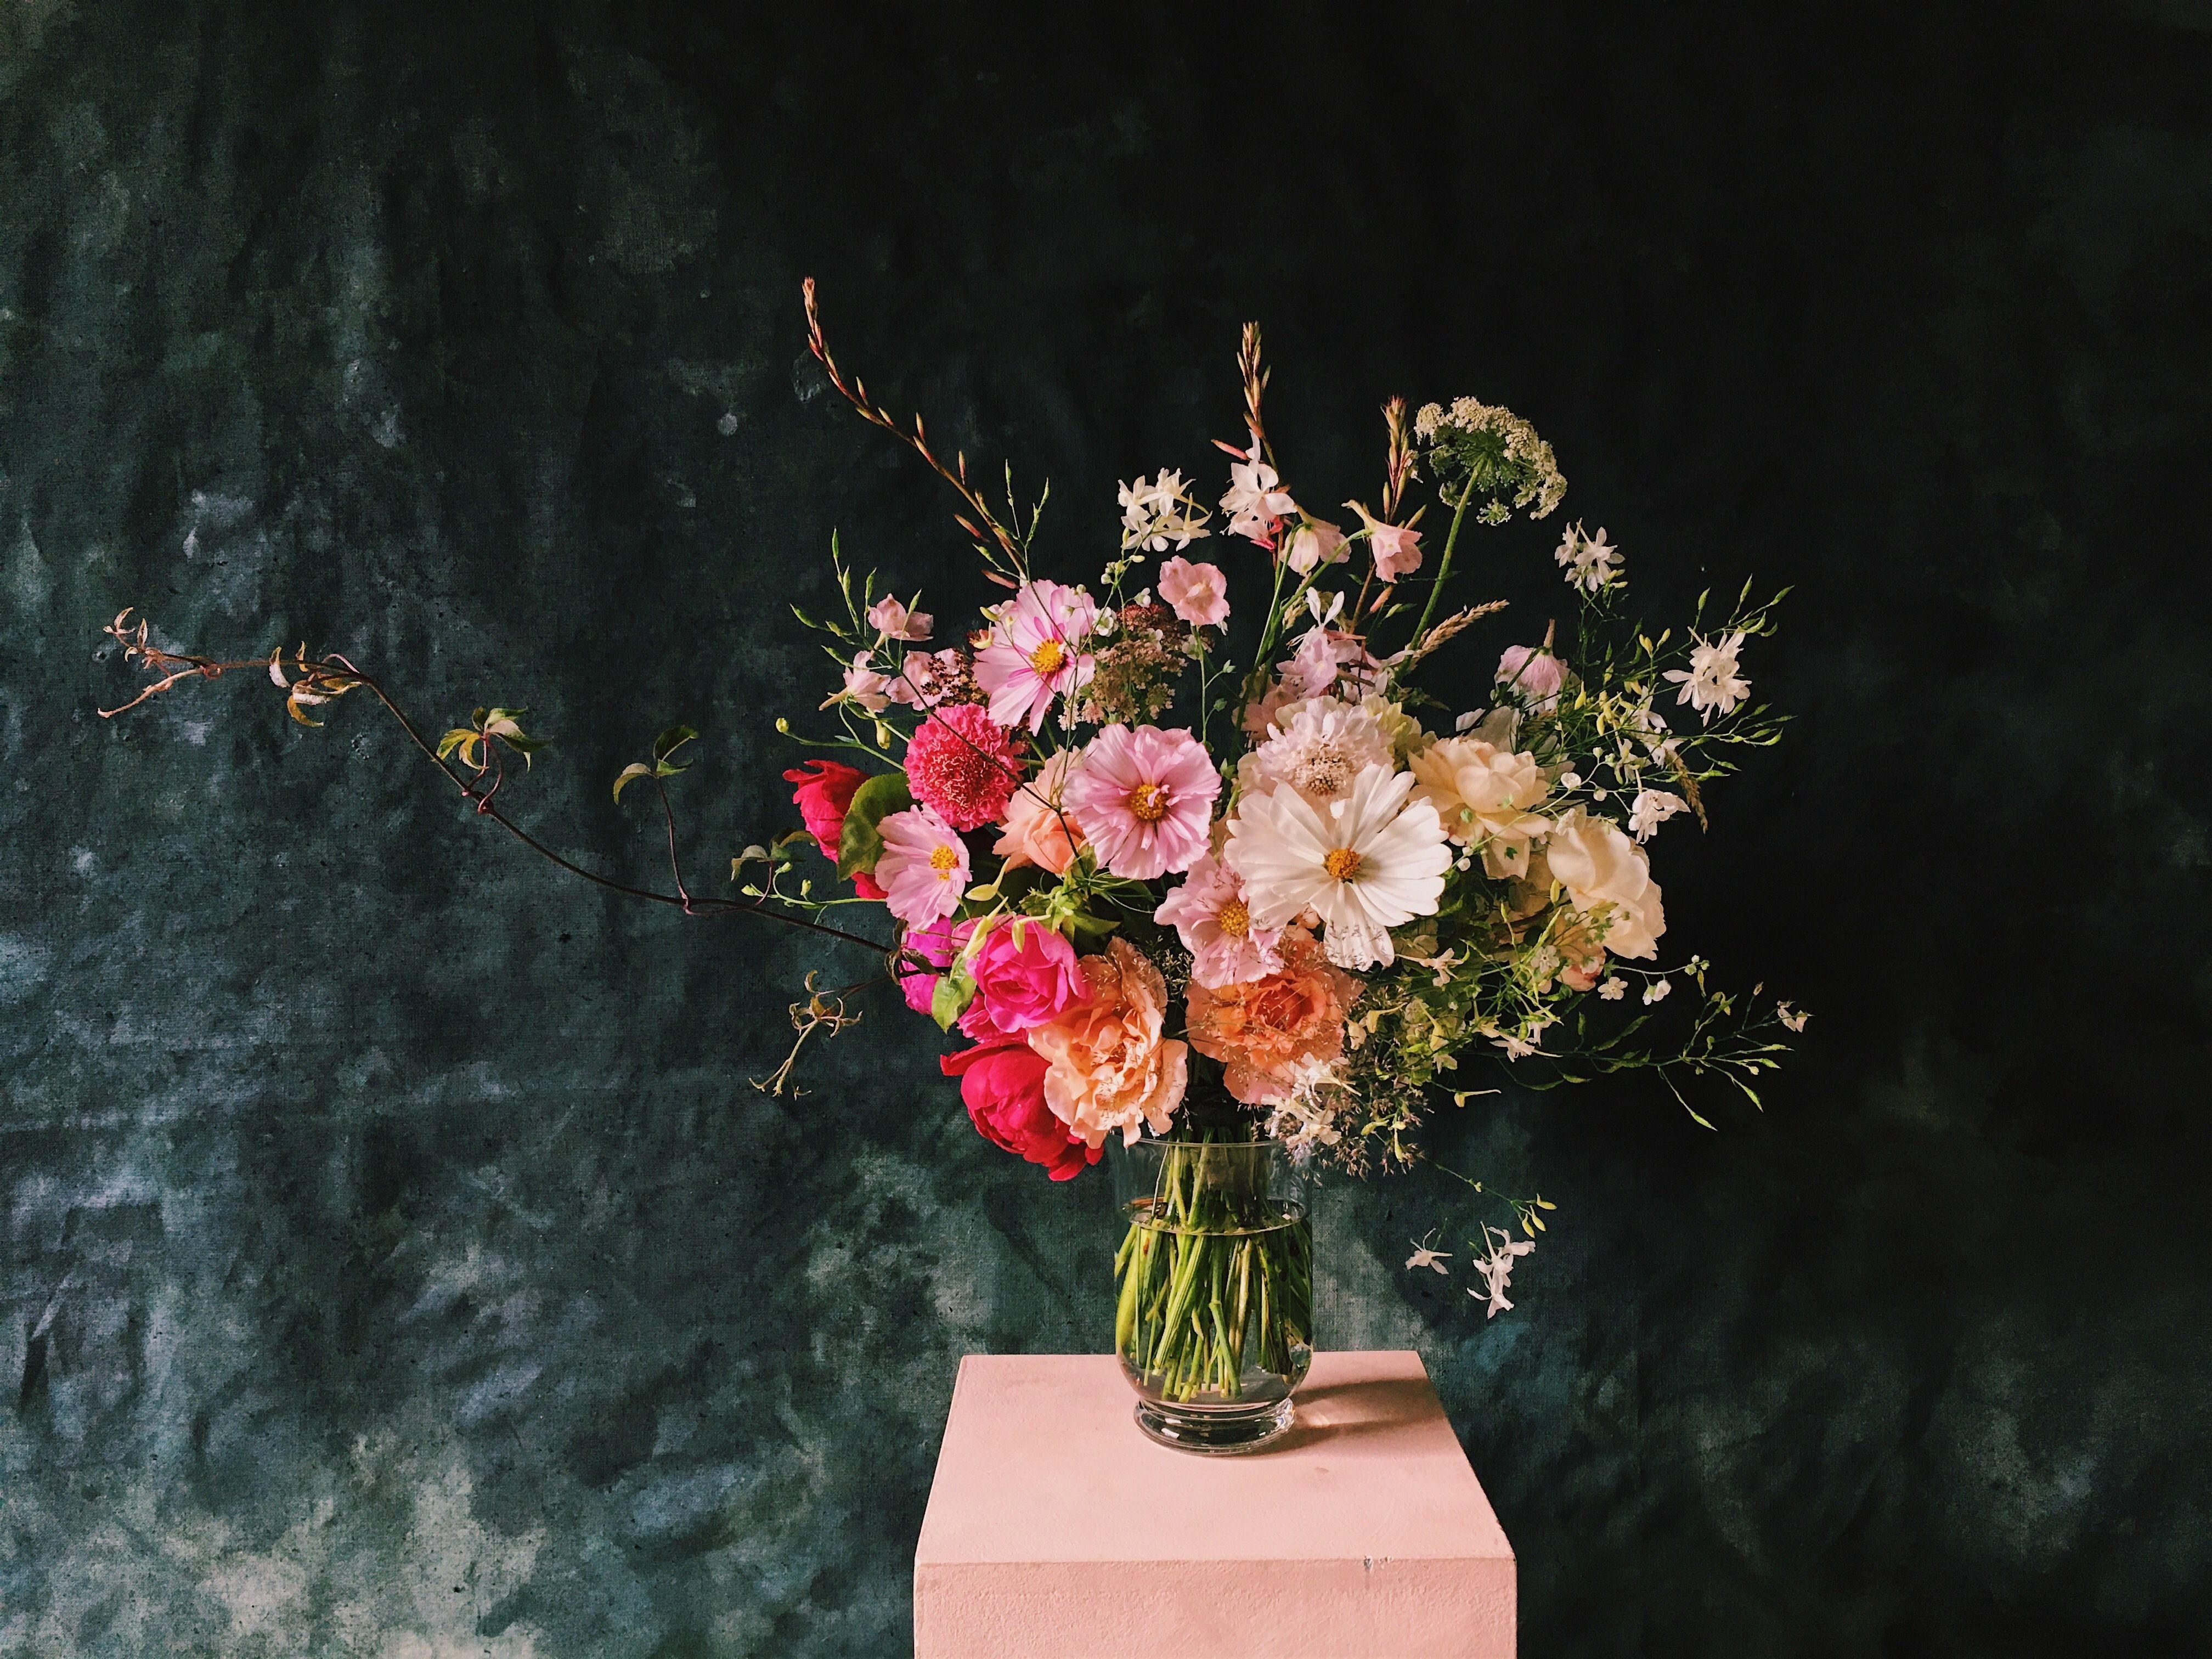 Absolutely Foolproof Ways to Make Spring Flowers Last Longer